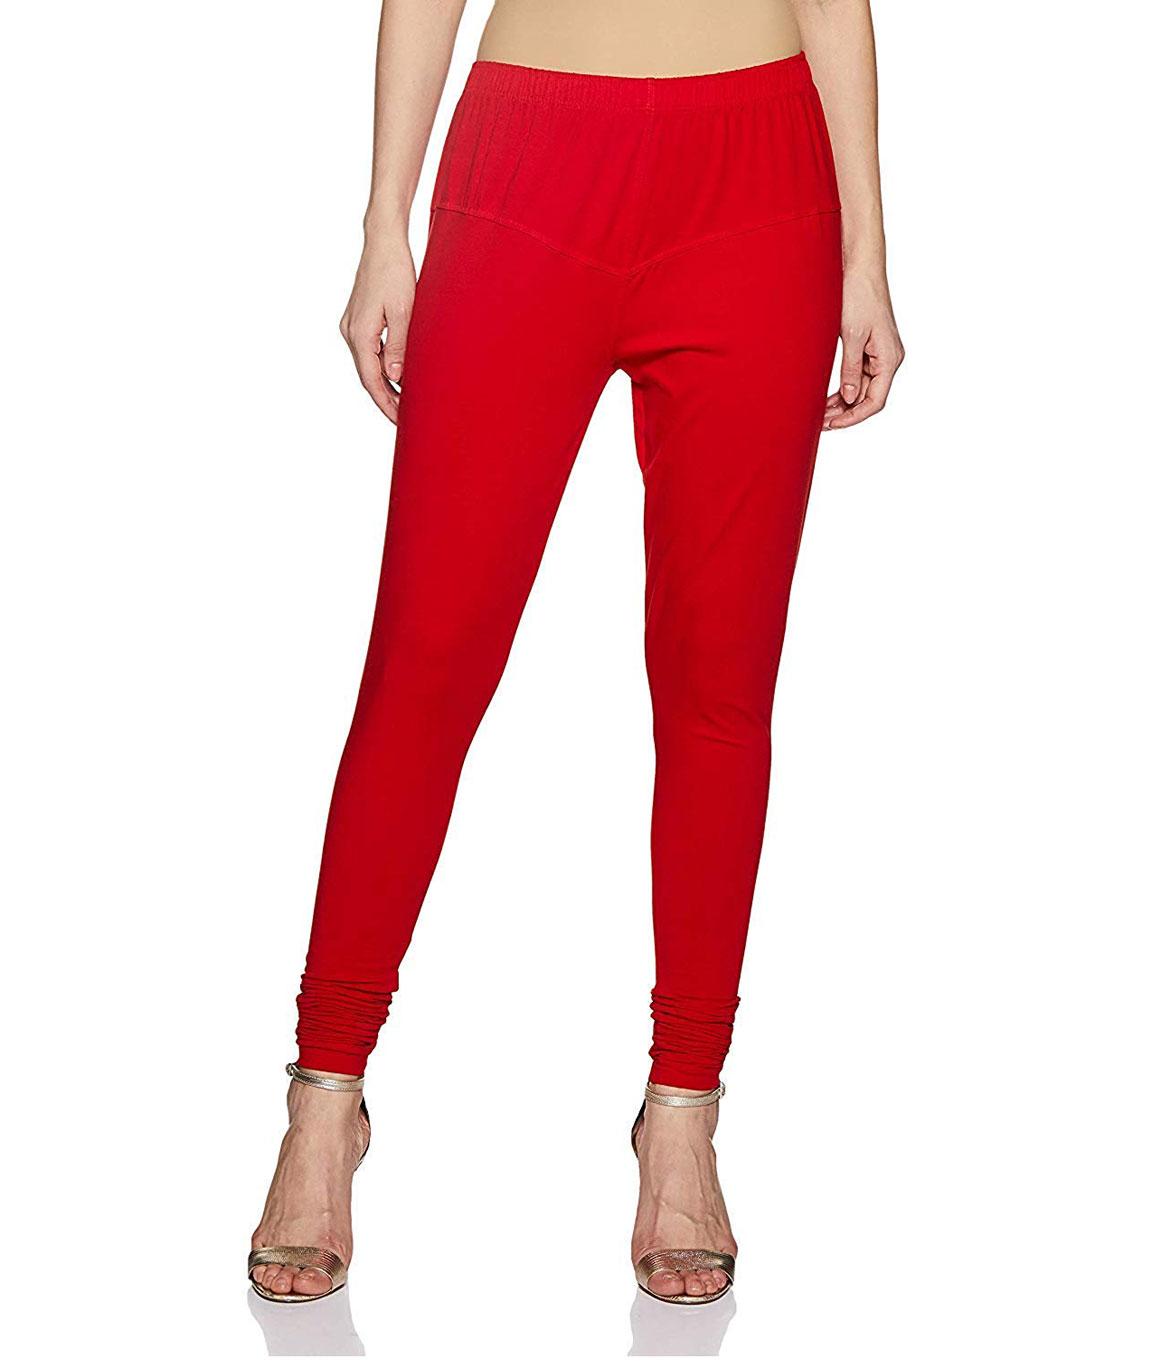 Swag  Cotton Leggings Churidar, Comfortable, and Soft Leggings(red)